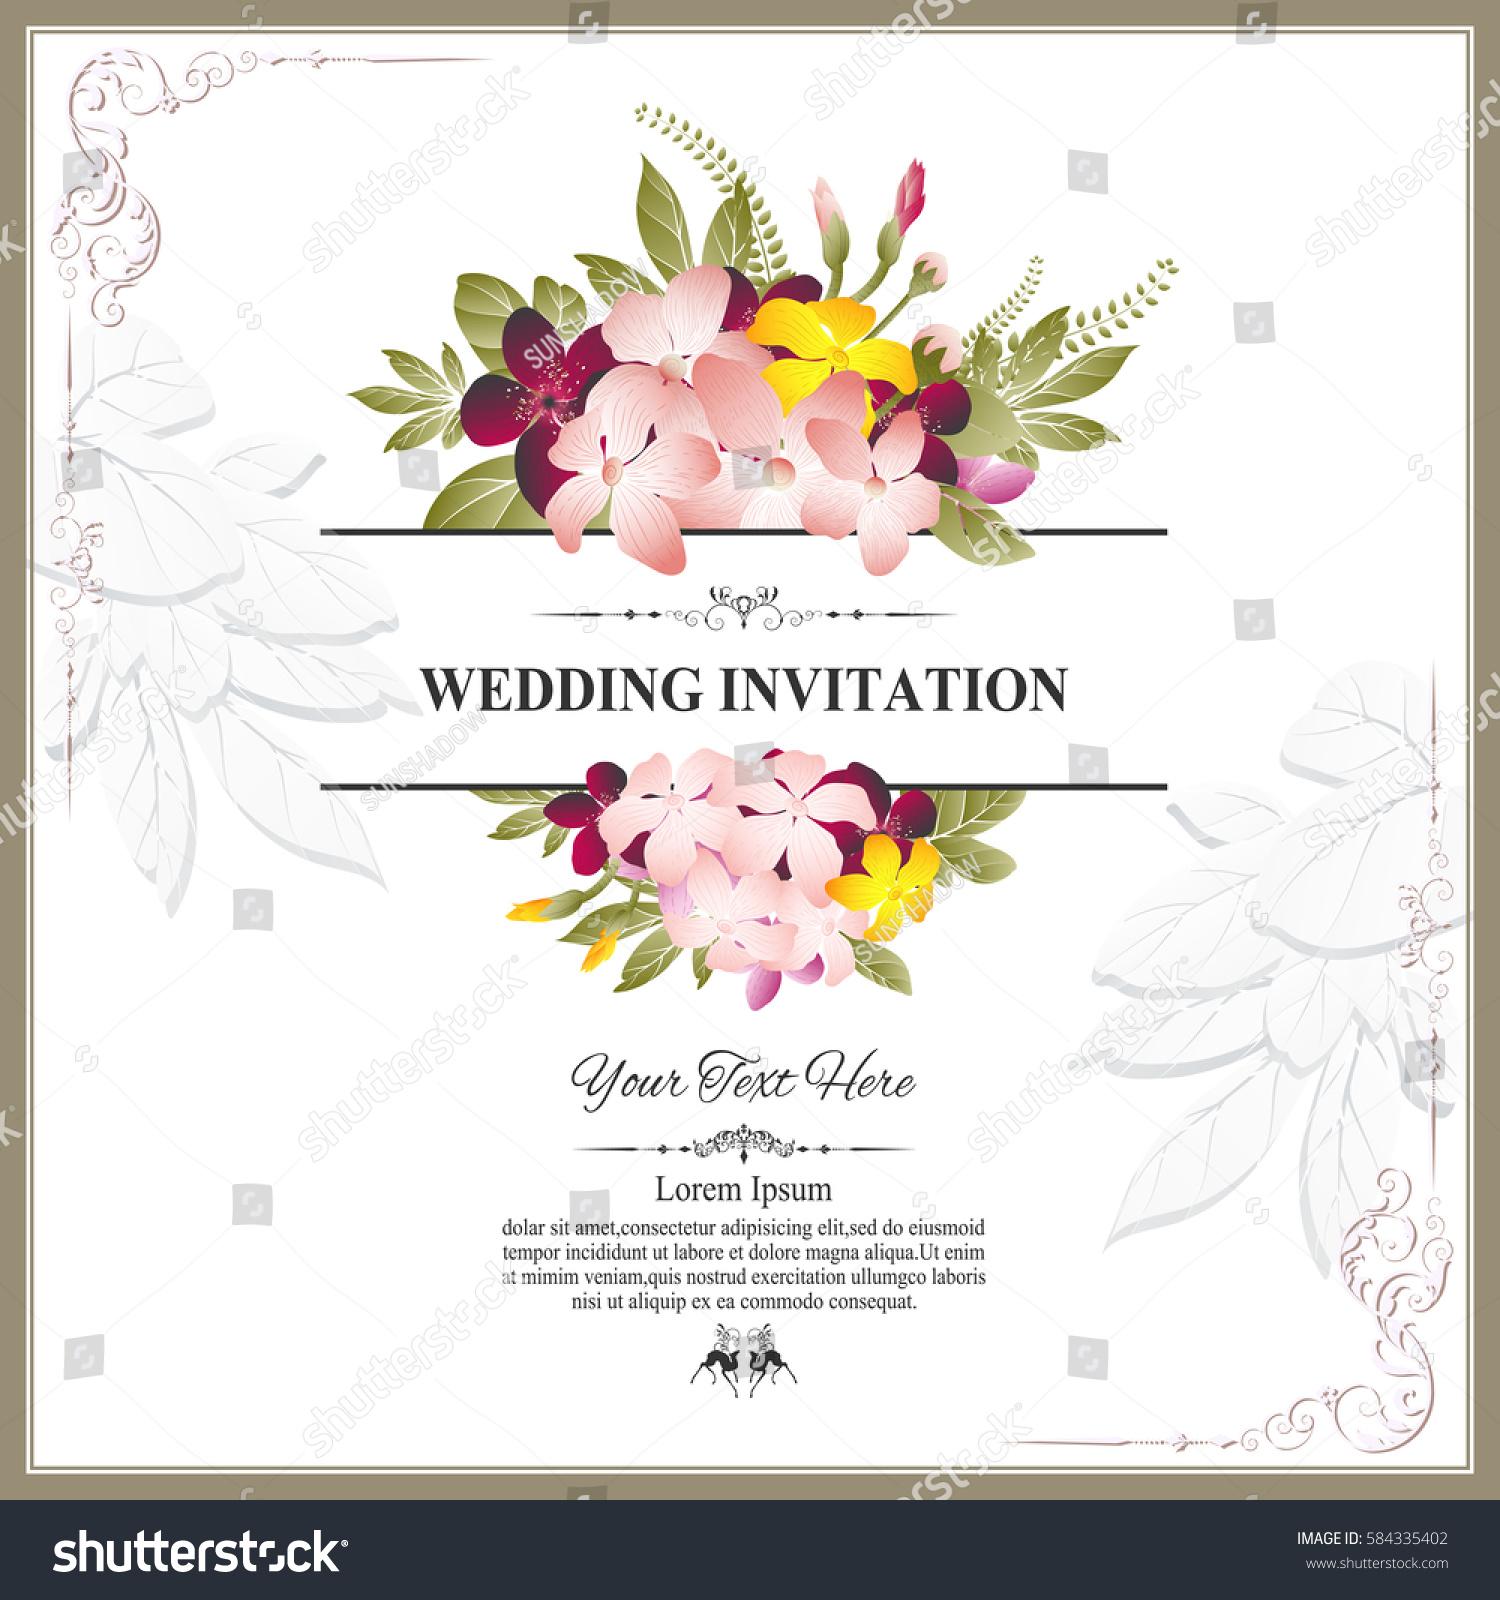 Invitation card or wedding card with floral pattern on background invitation card or wedding card with floral pattern on background contemporary vintage art framemotifs elements vector decorative retro greeting card stopboris Choice Image